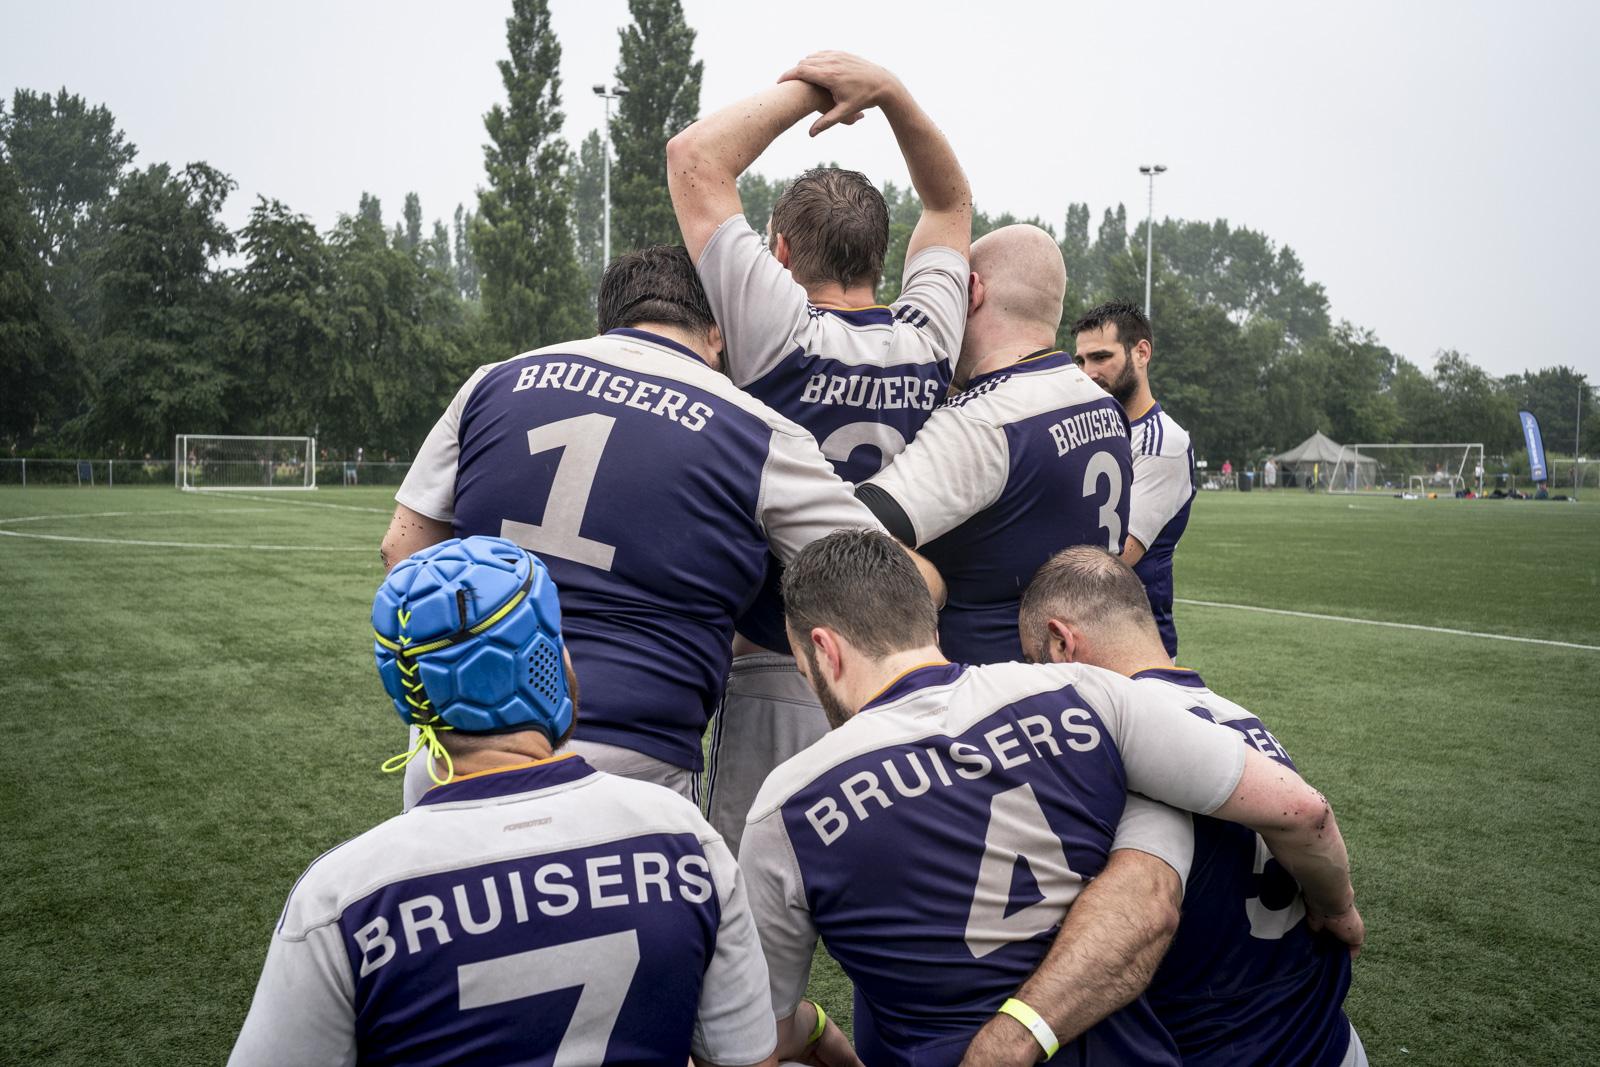 Berlin Bruisers